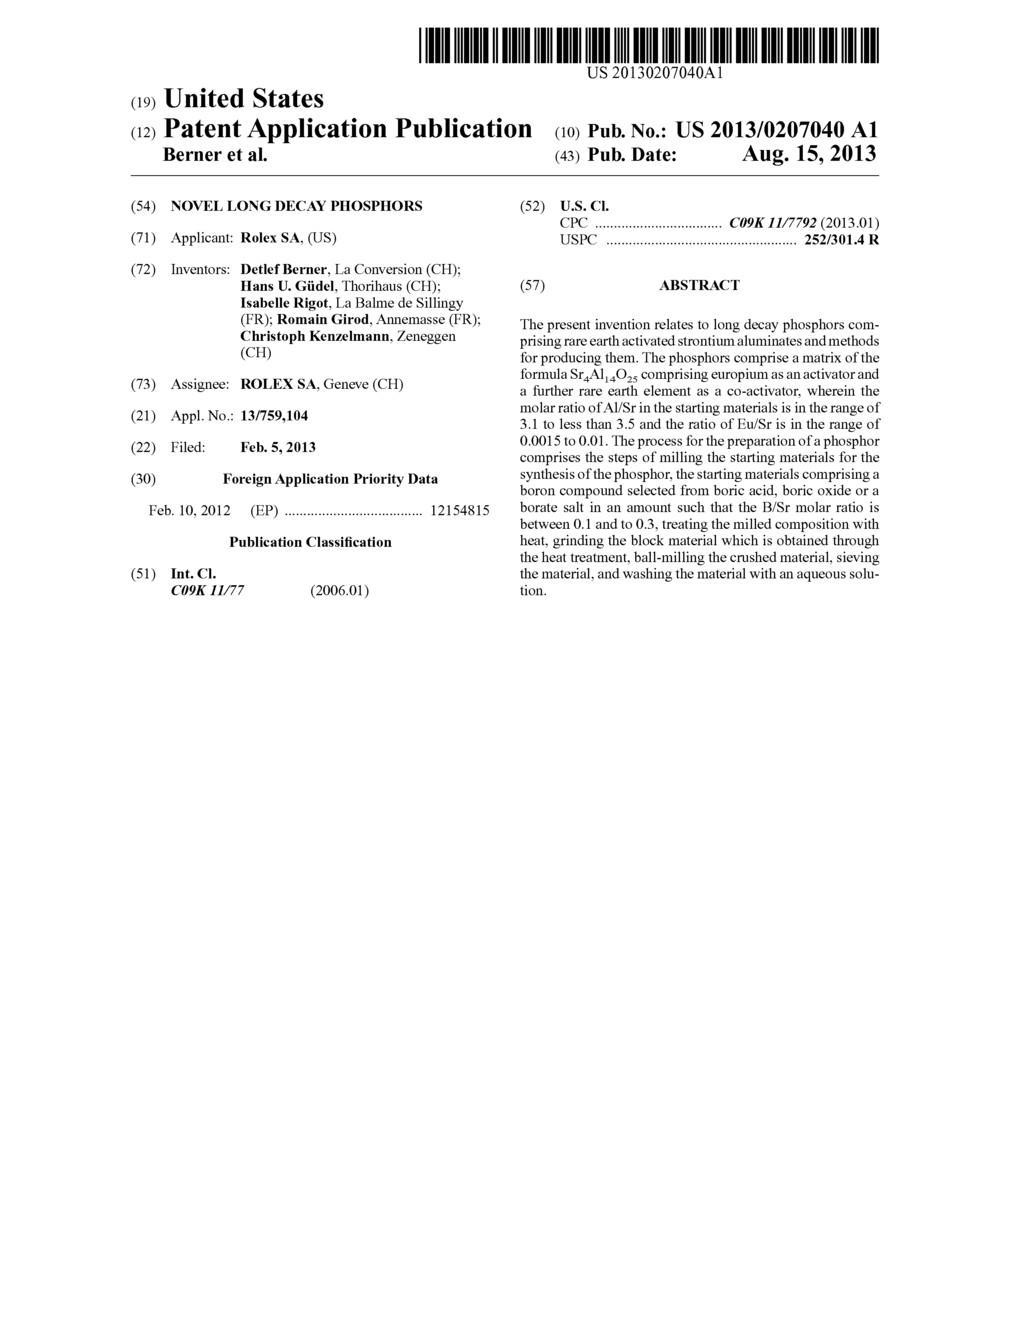 rolex-patent-15.jpg